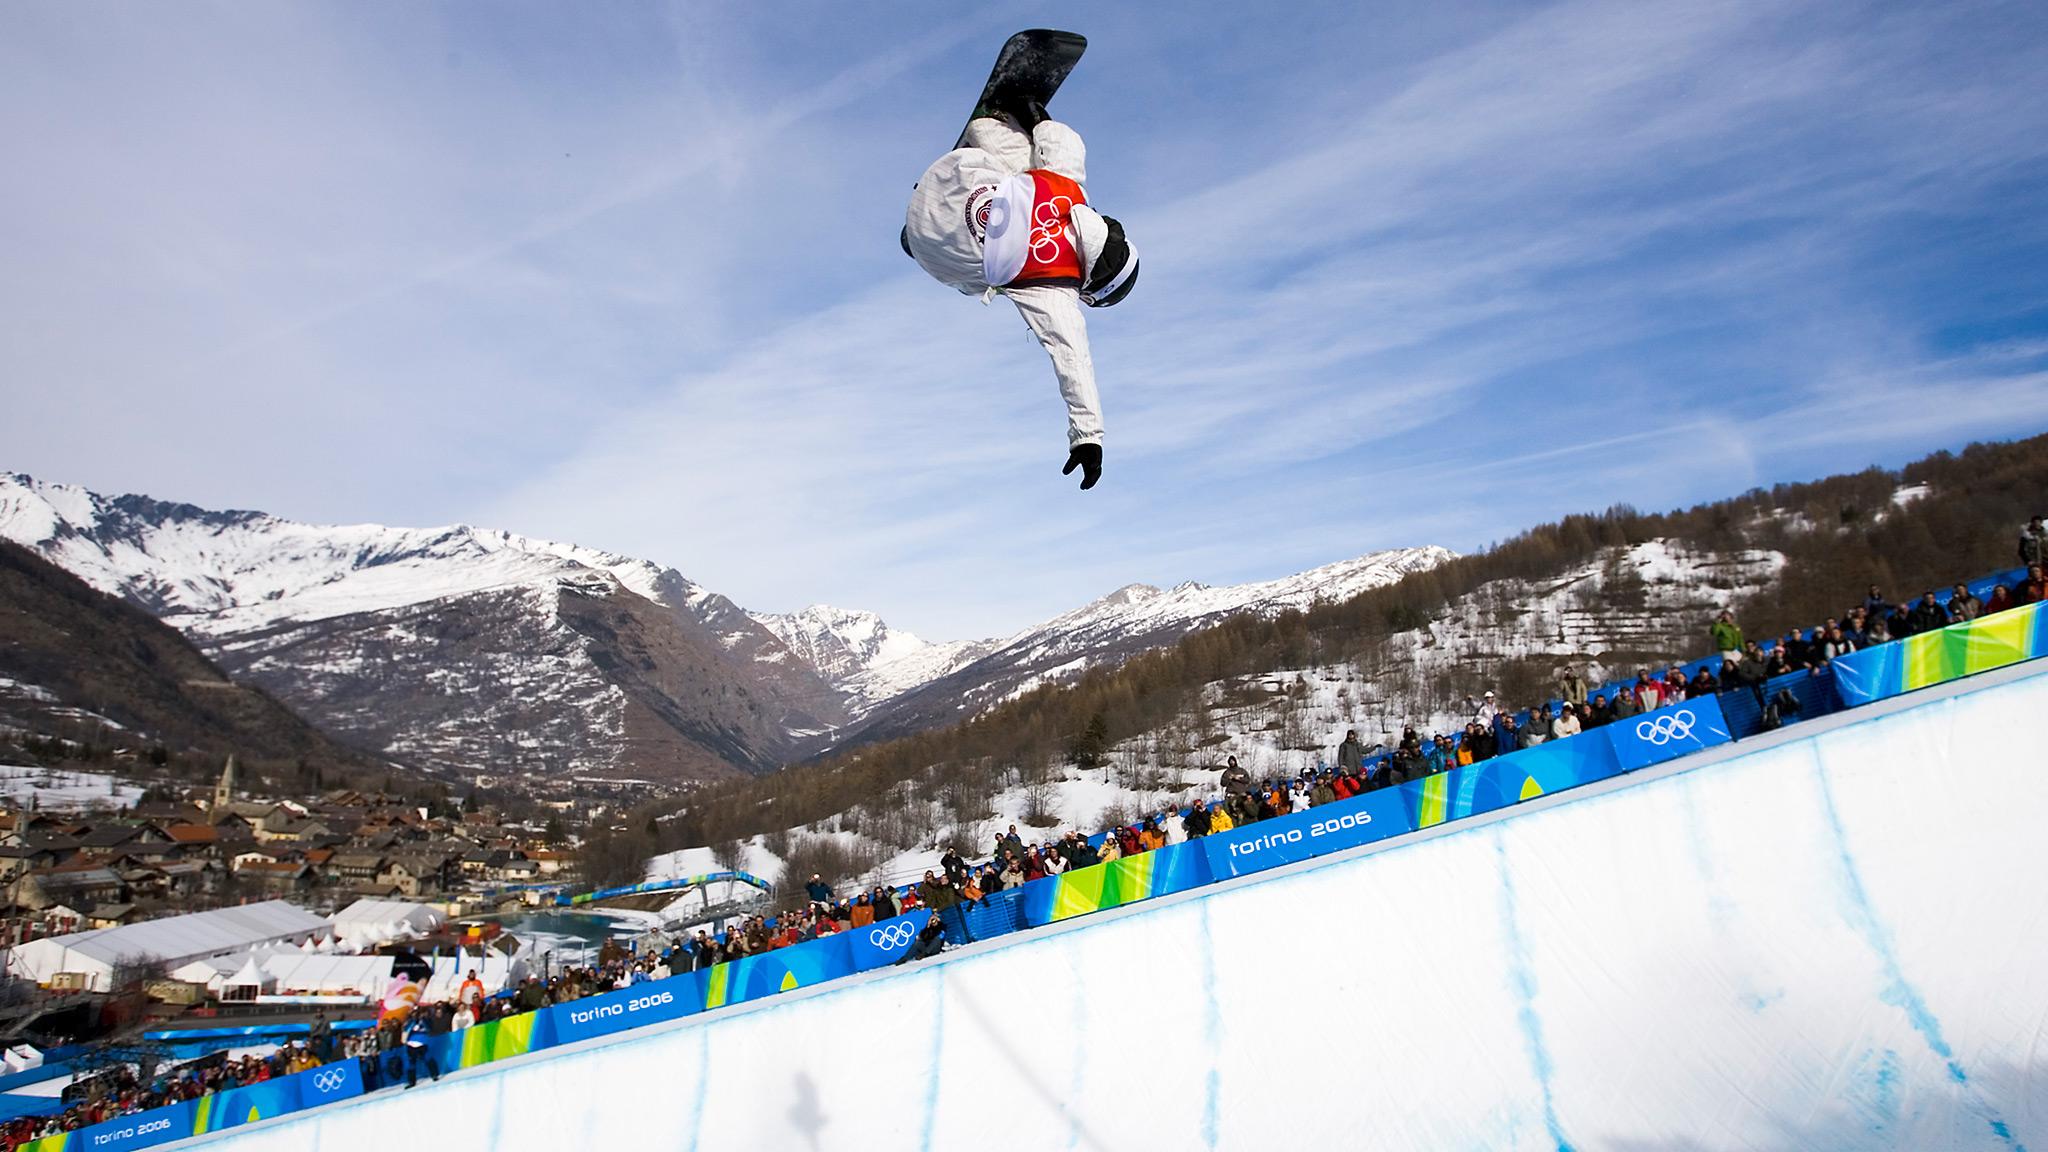 Winter Olympics, 2006